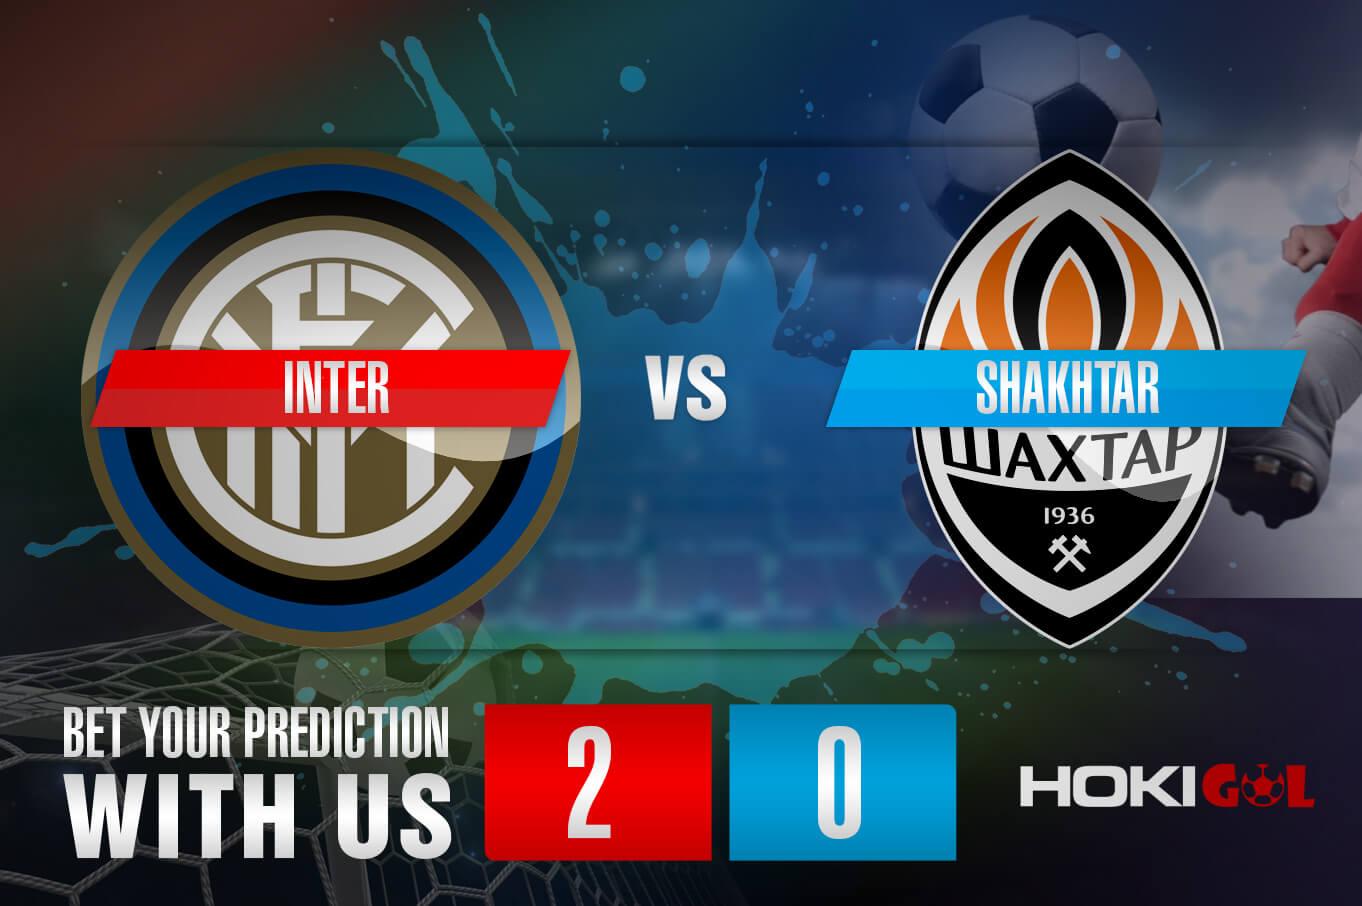 Prediksi Bola Inter Vs Shakhtar 10 Desember 2020